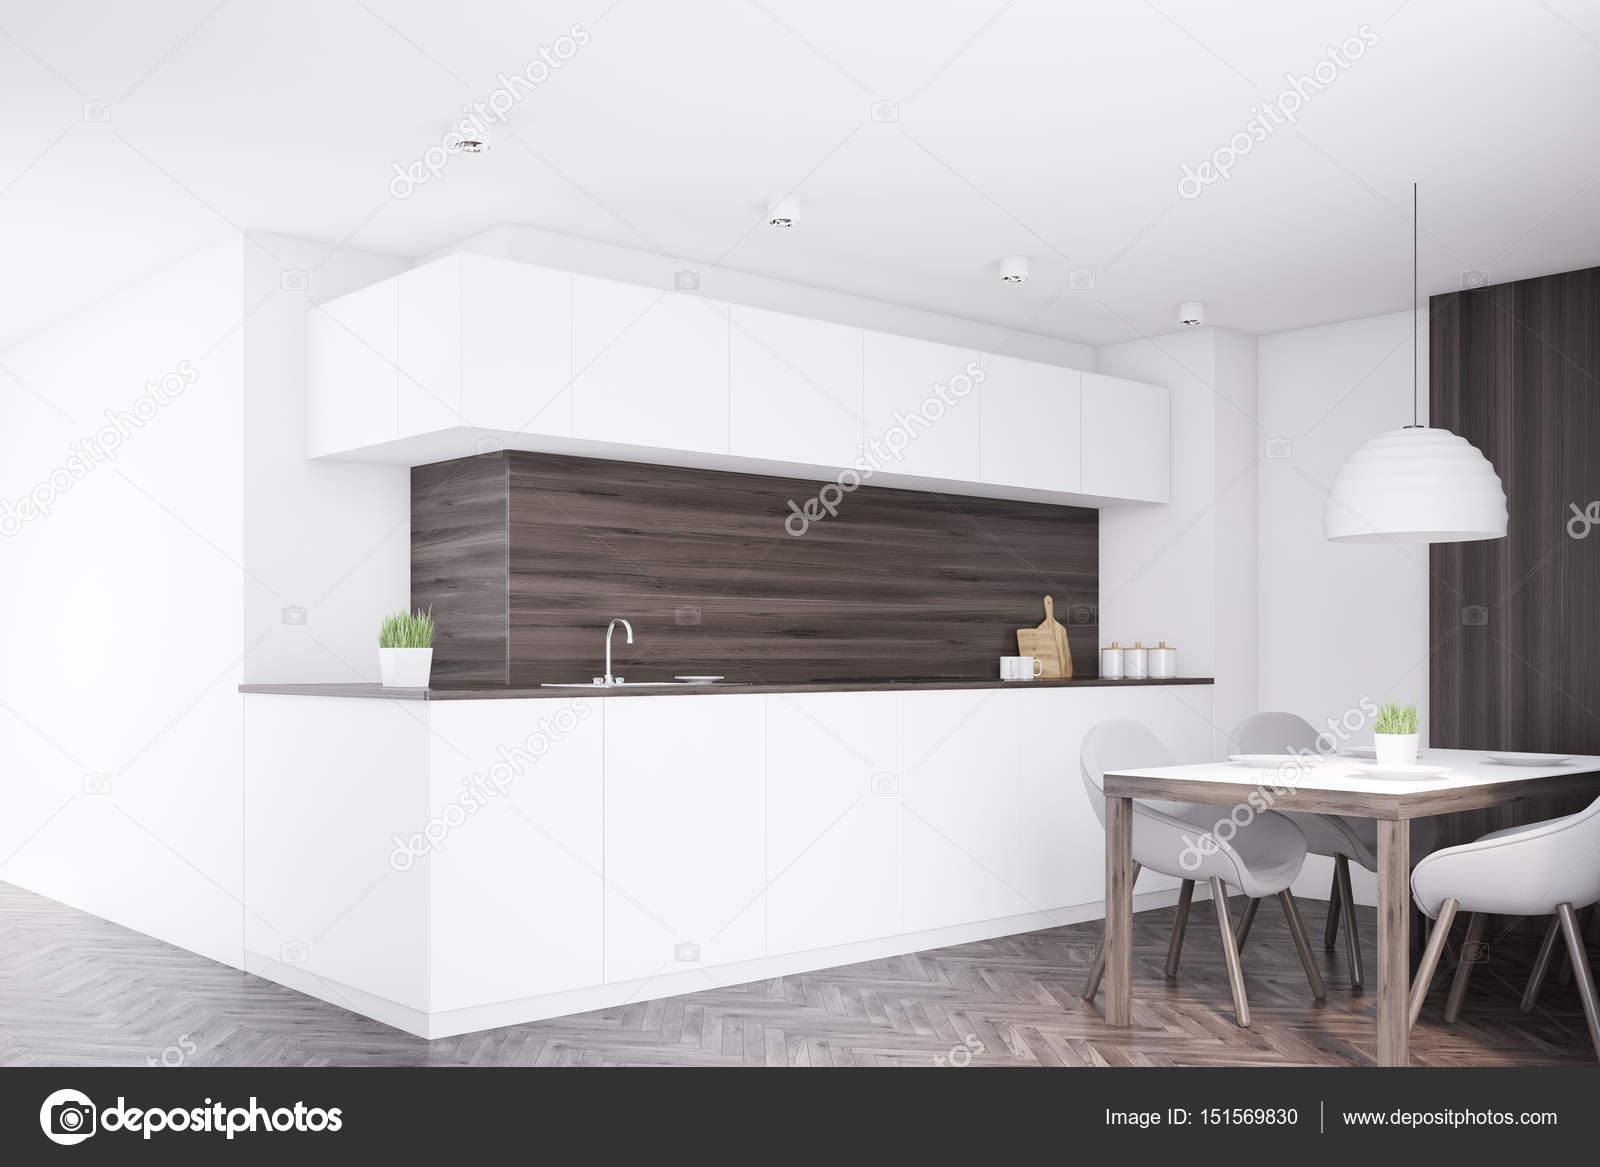 kitchen table nook curtain sets 昏暗的厨房柜台 桌子 角 图库照片 c denisismagilov 151569830 角落里的厨房内政部与黑暗的木墙 白色的台面和一张餐桌和四把椅子 3d 渲染 小样 照片作者denisismagilov